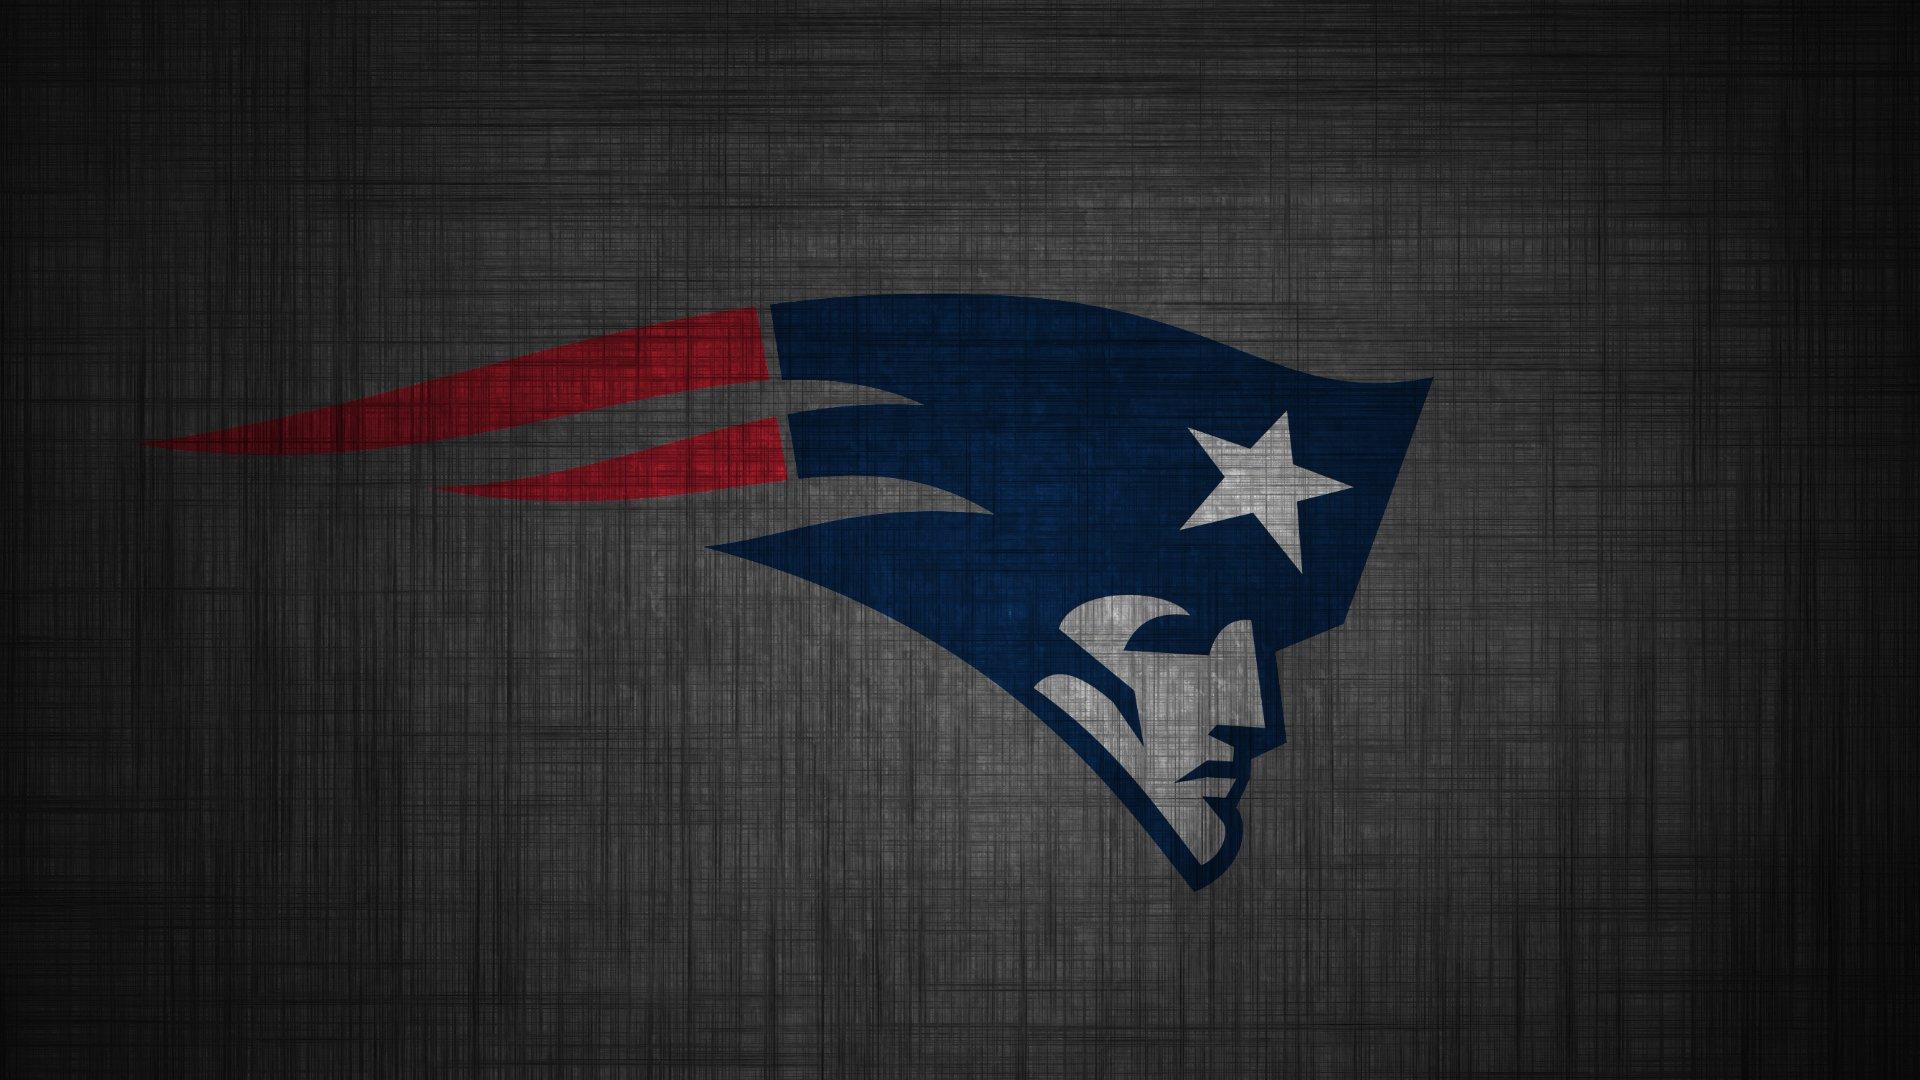 New England Patriots Screensaver Wallpaper - New England Patriots Desktop - HD Wallpaper